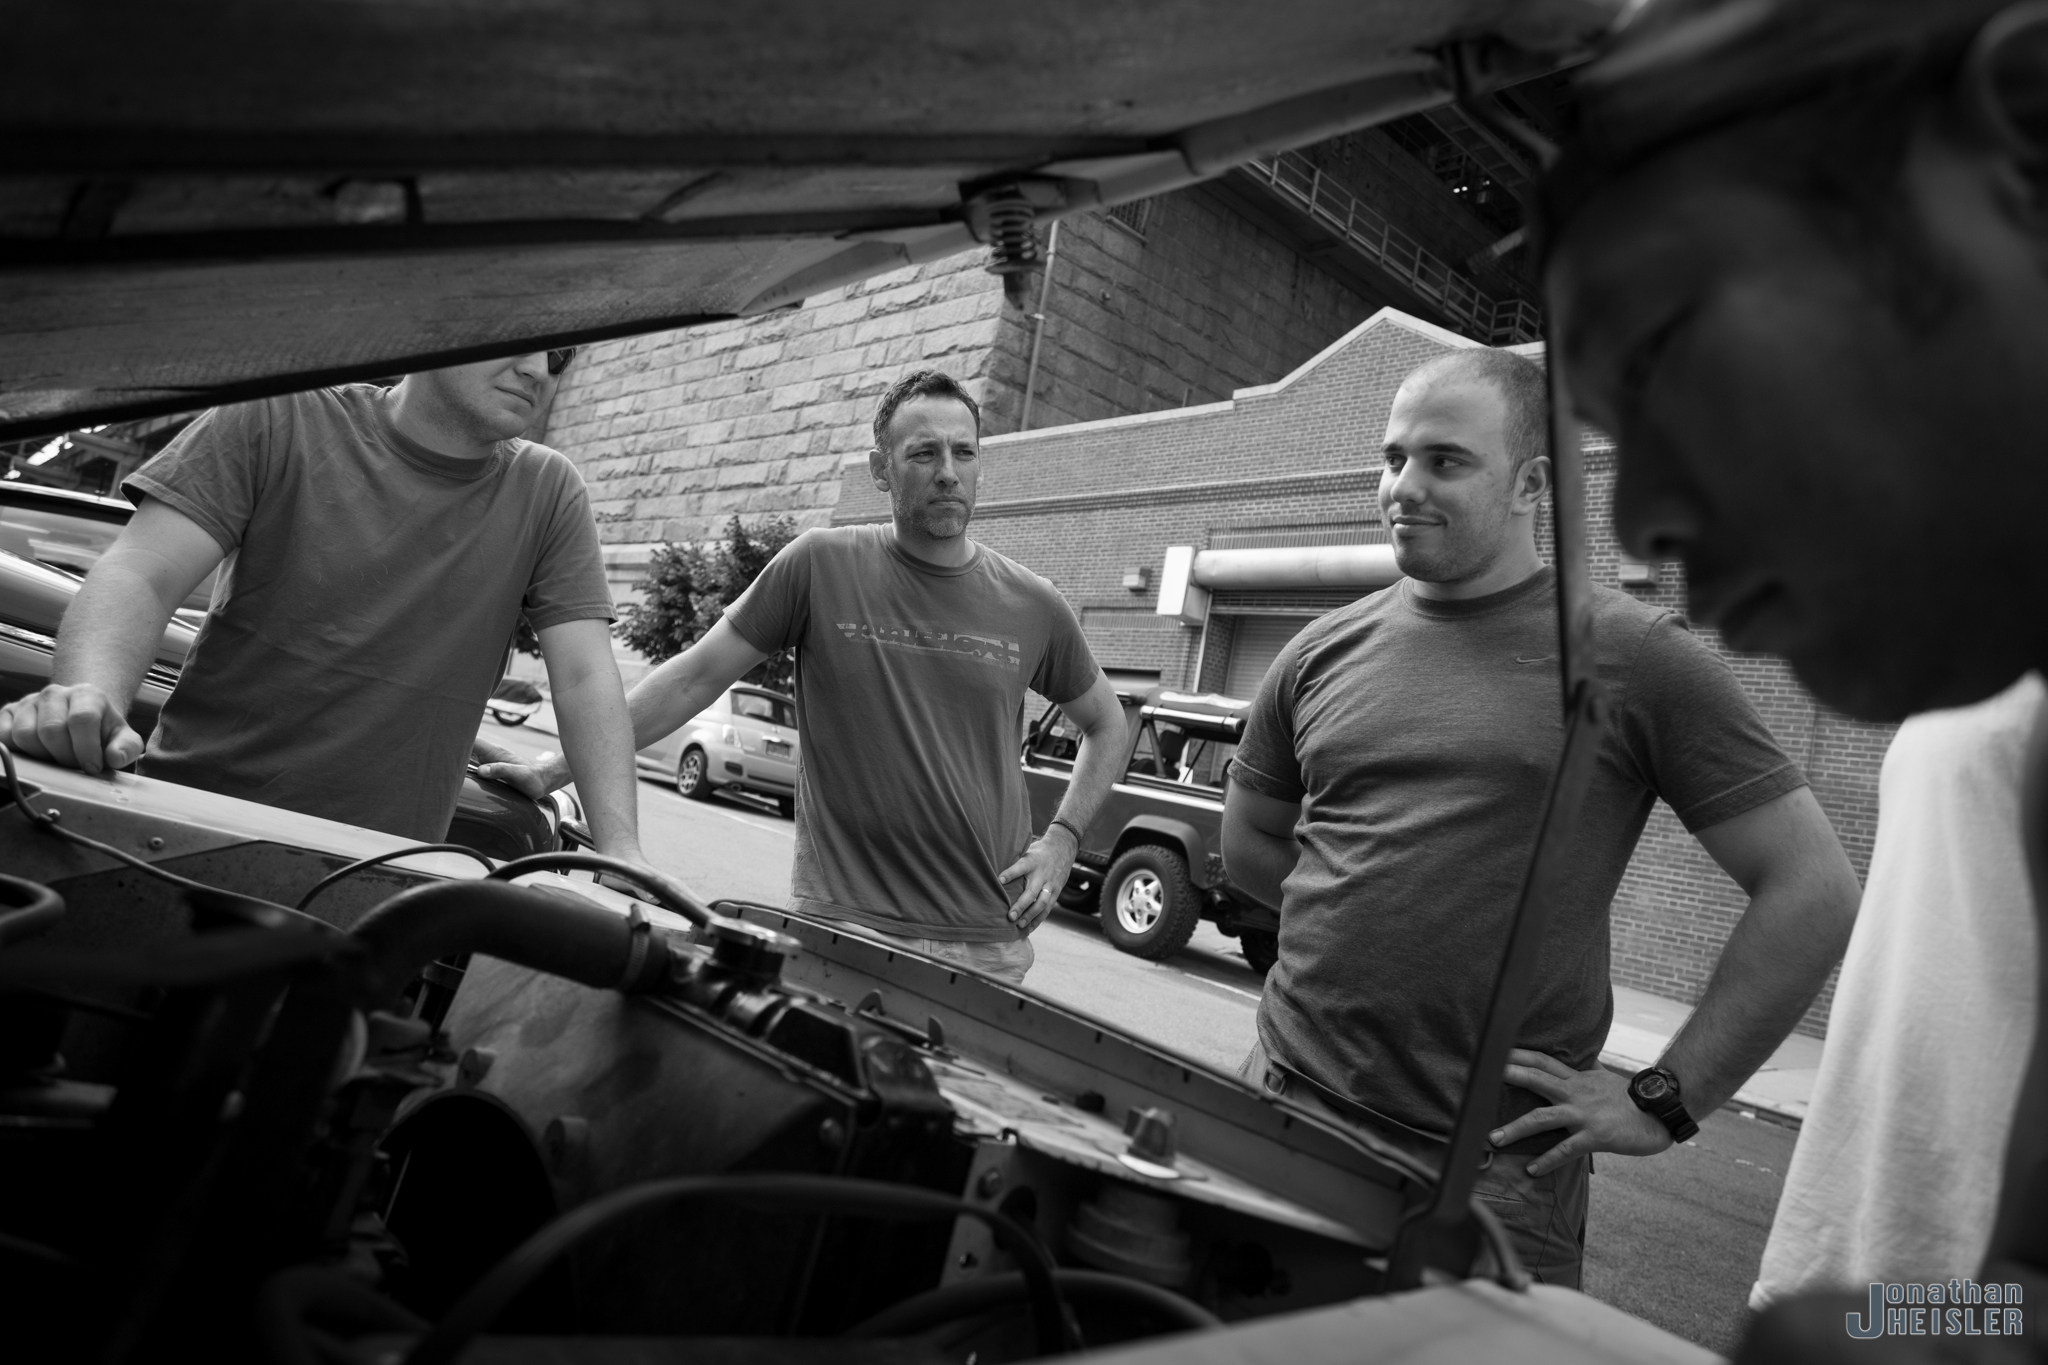 6-22-2014 _ Land Rover Defender  _  New York City00013.jpg